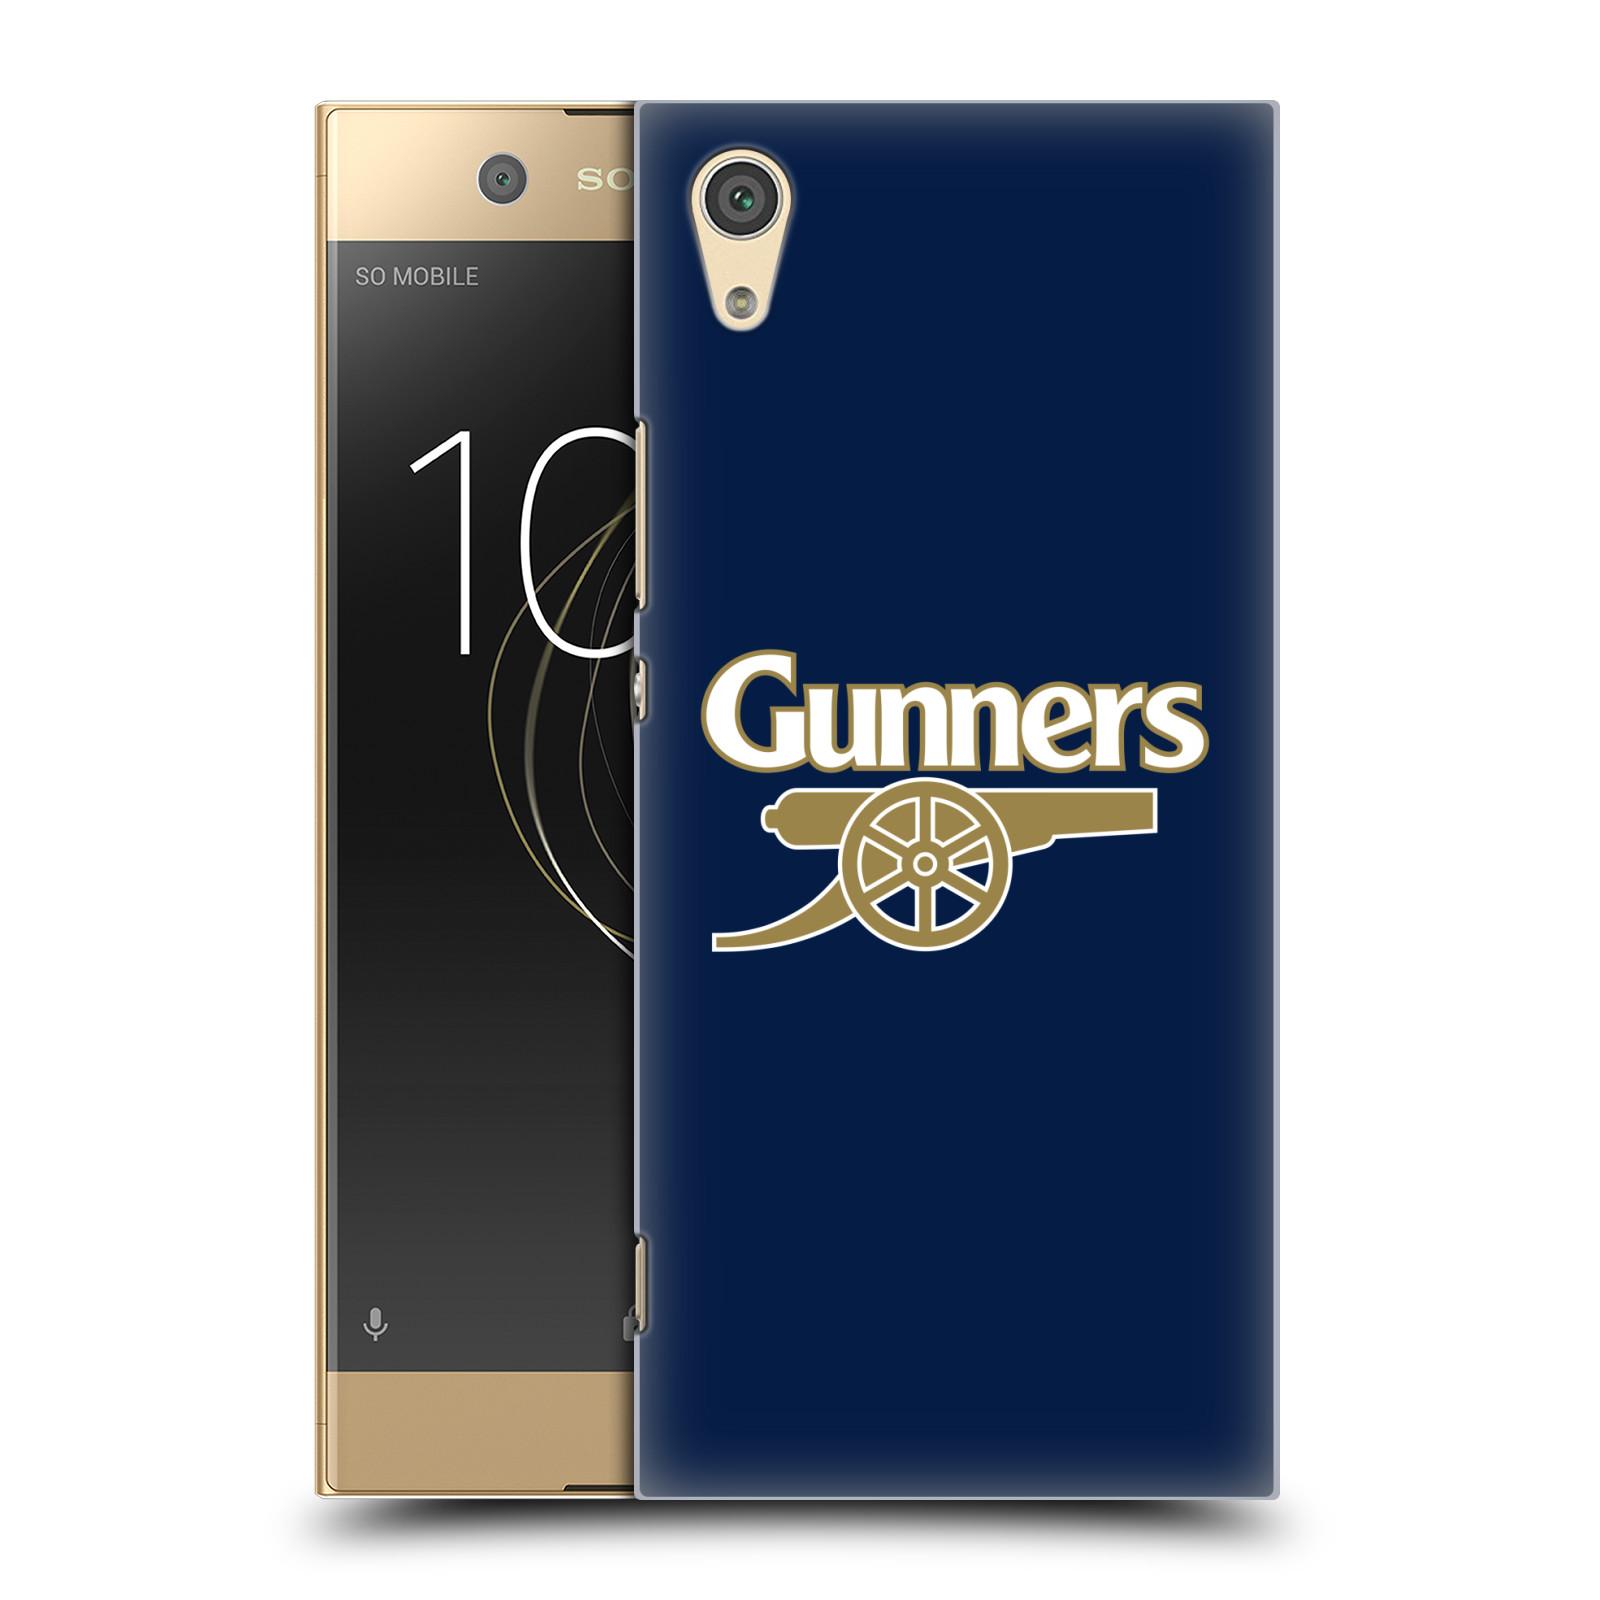 Plastové pouzdro na mobil Sony Xperia XA1 - Head Case - Arsenal FC - Gunners